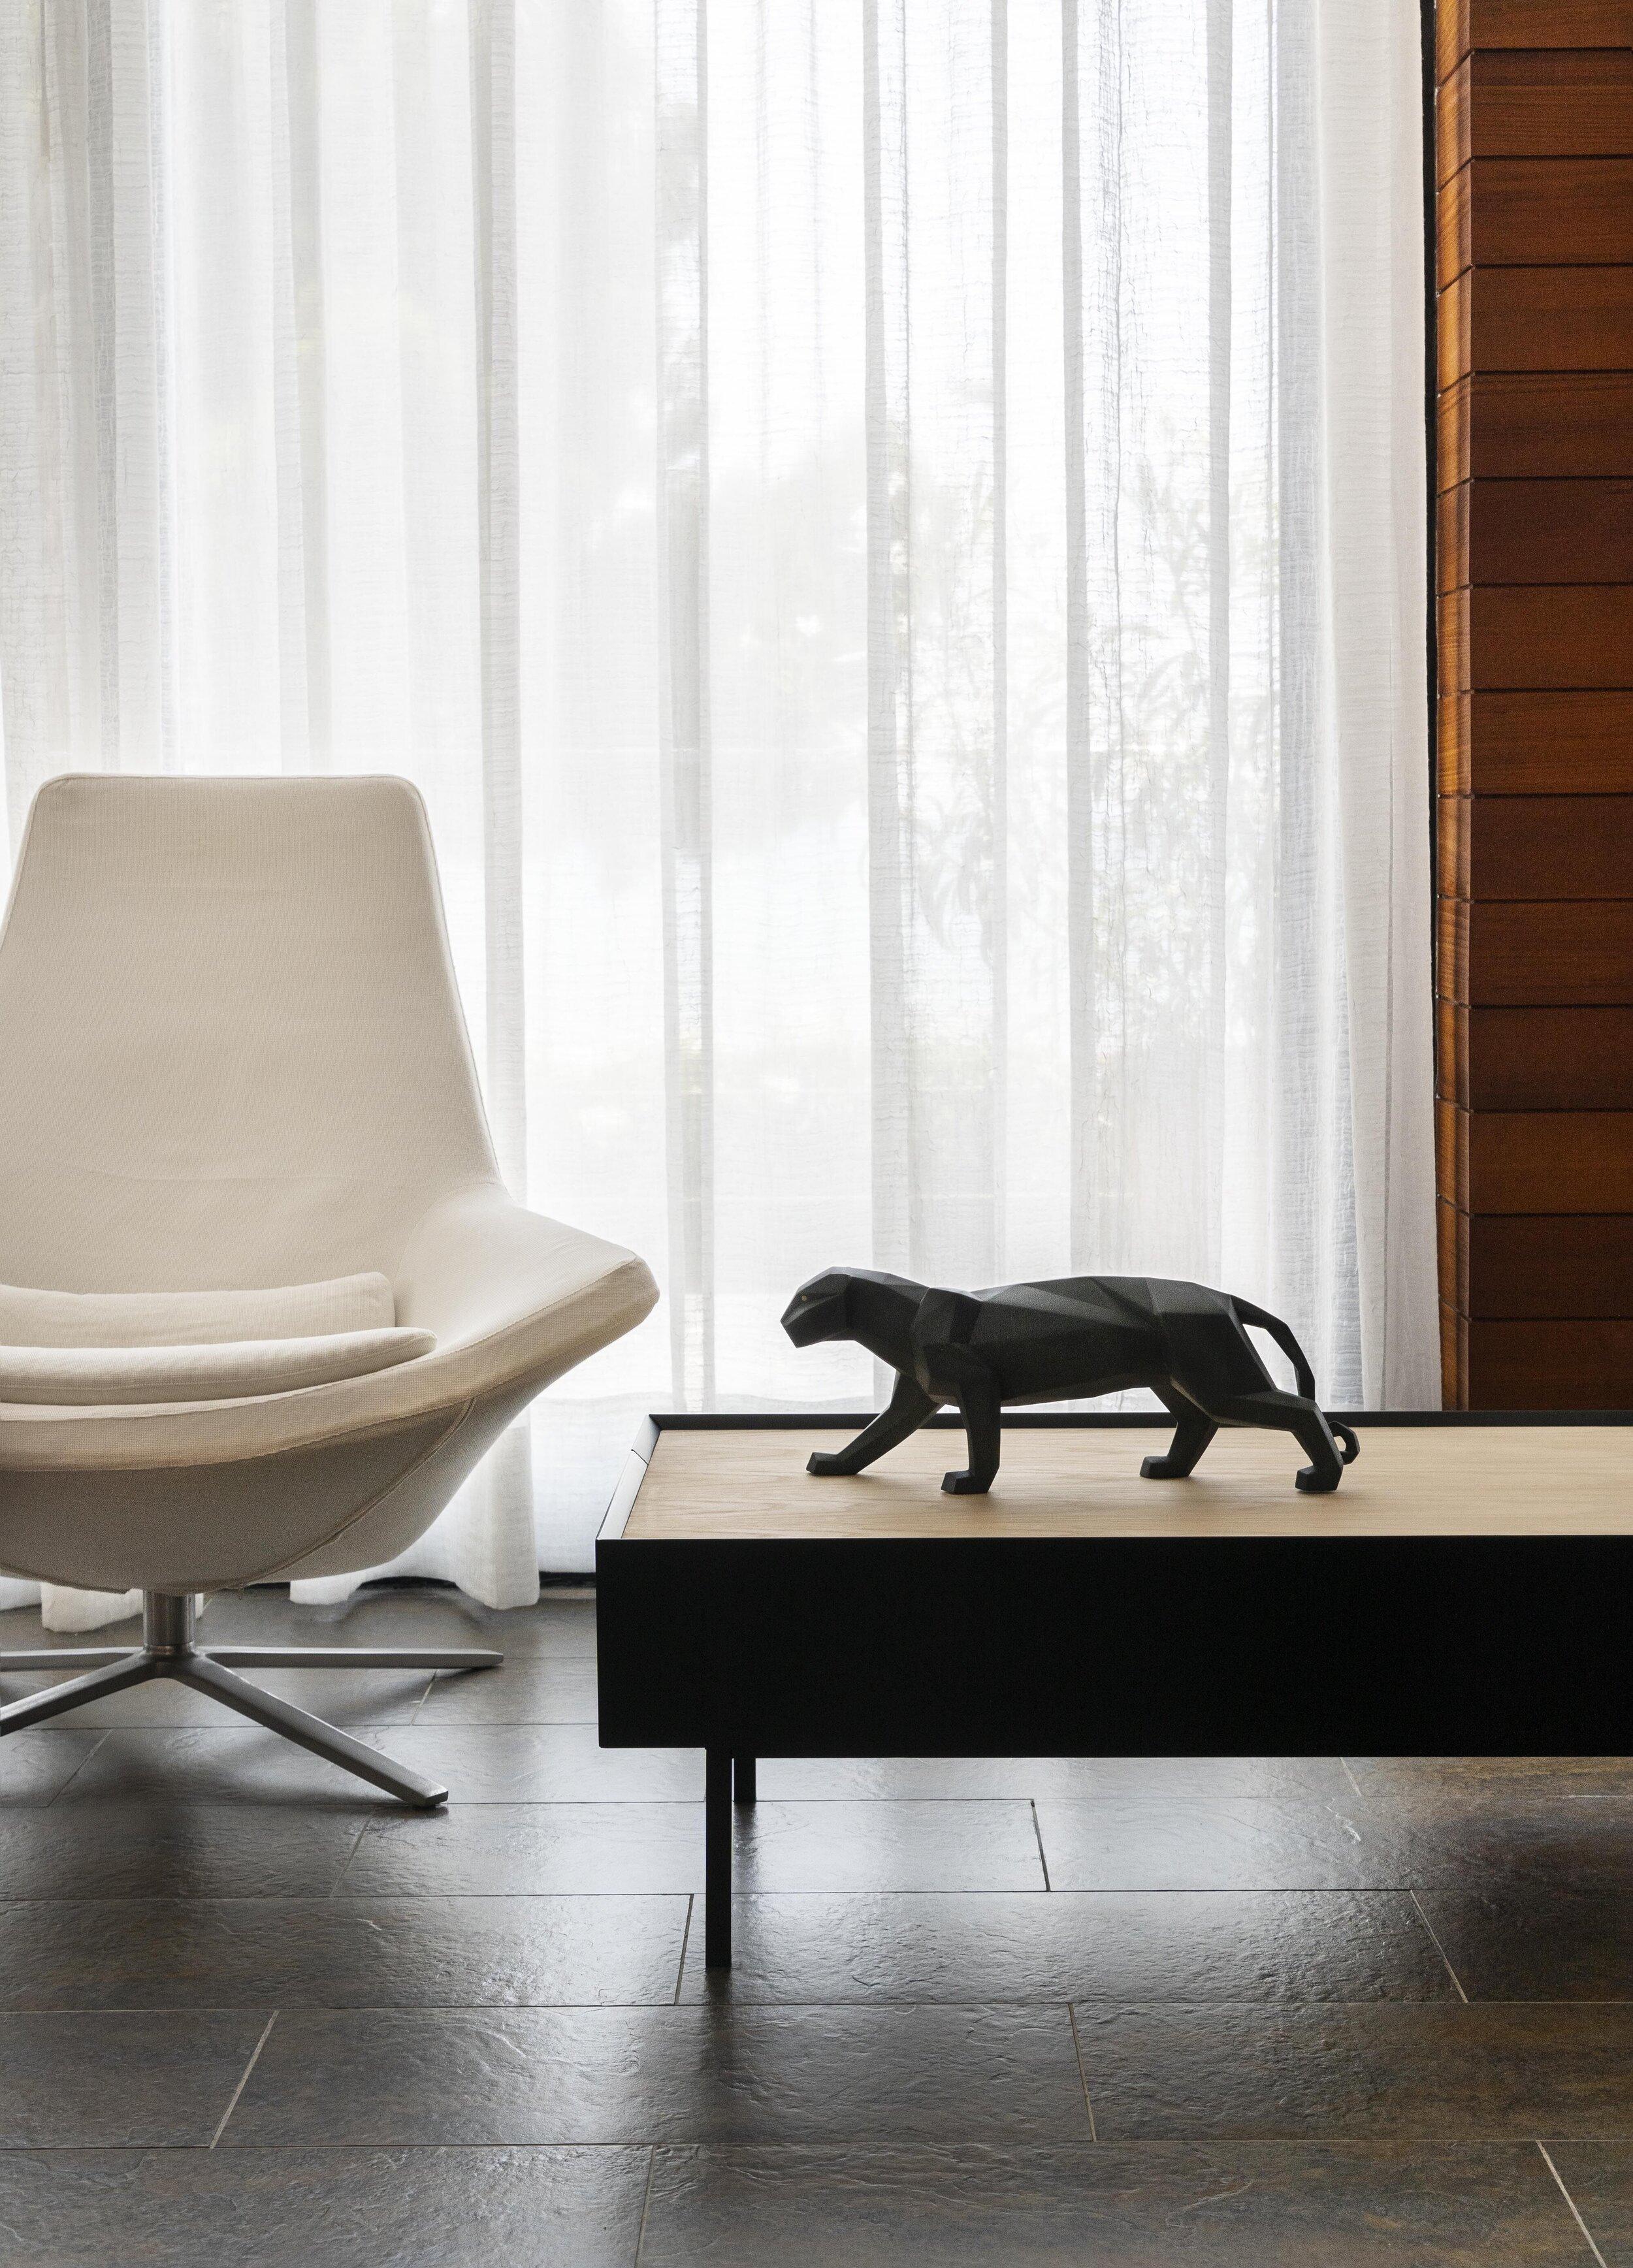 Leopard Resin Sculpture Model Office Bar Black Panther Crafts ... | 3473x2500